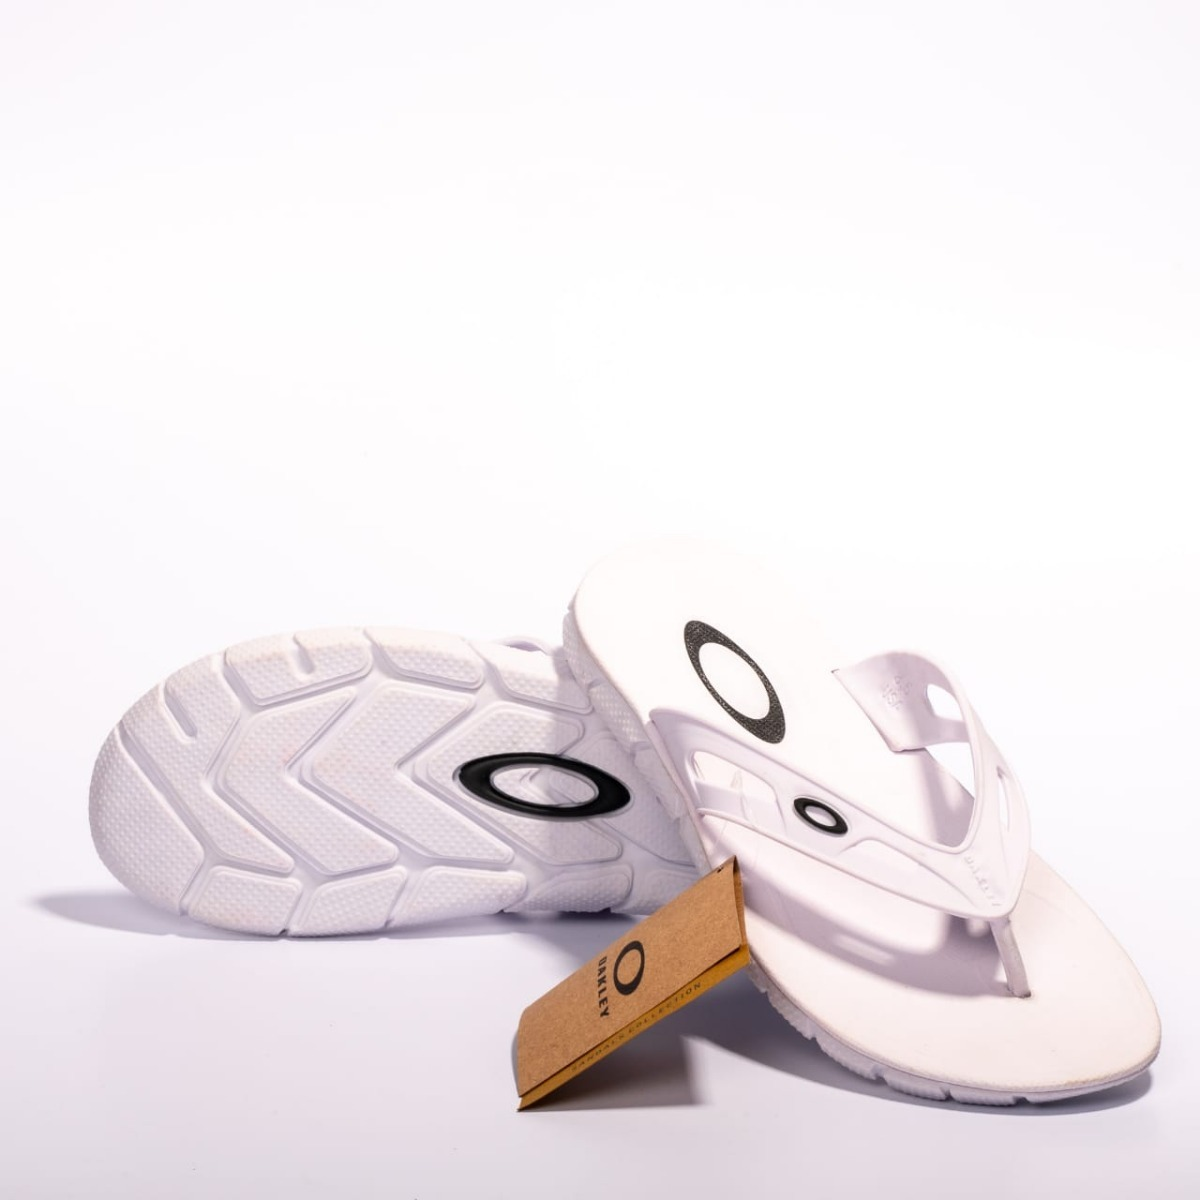 chinelo oakley rest branco original importado envio imediato. Carregando  zoom. 71aac5736f7